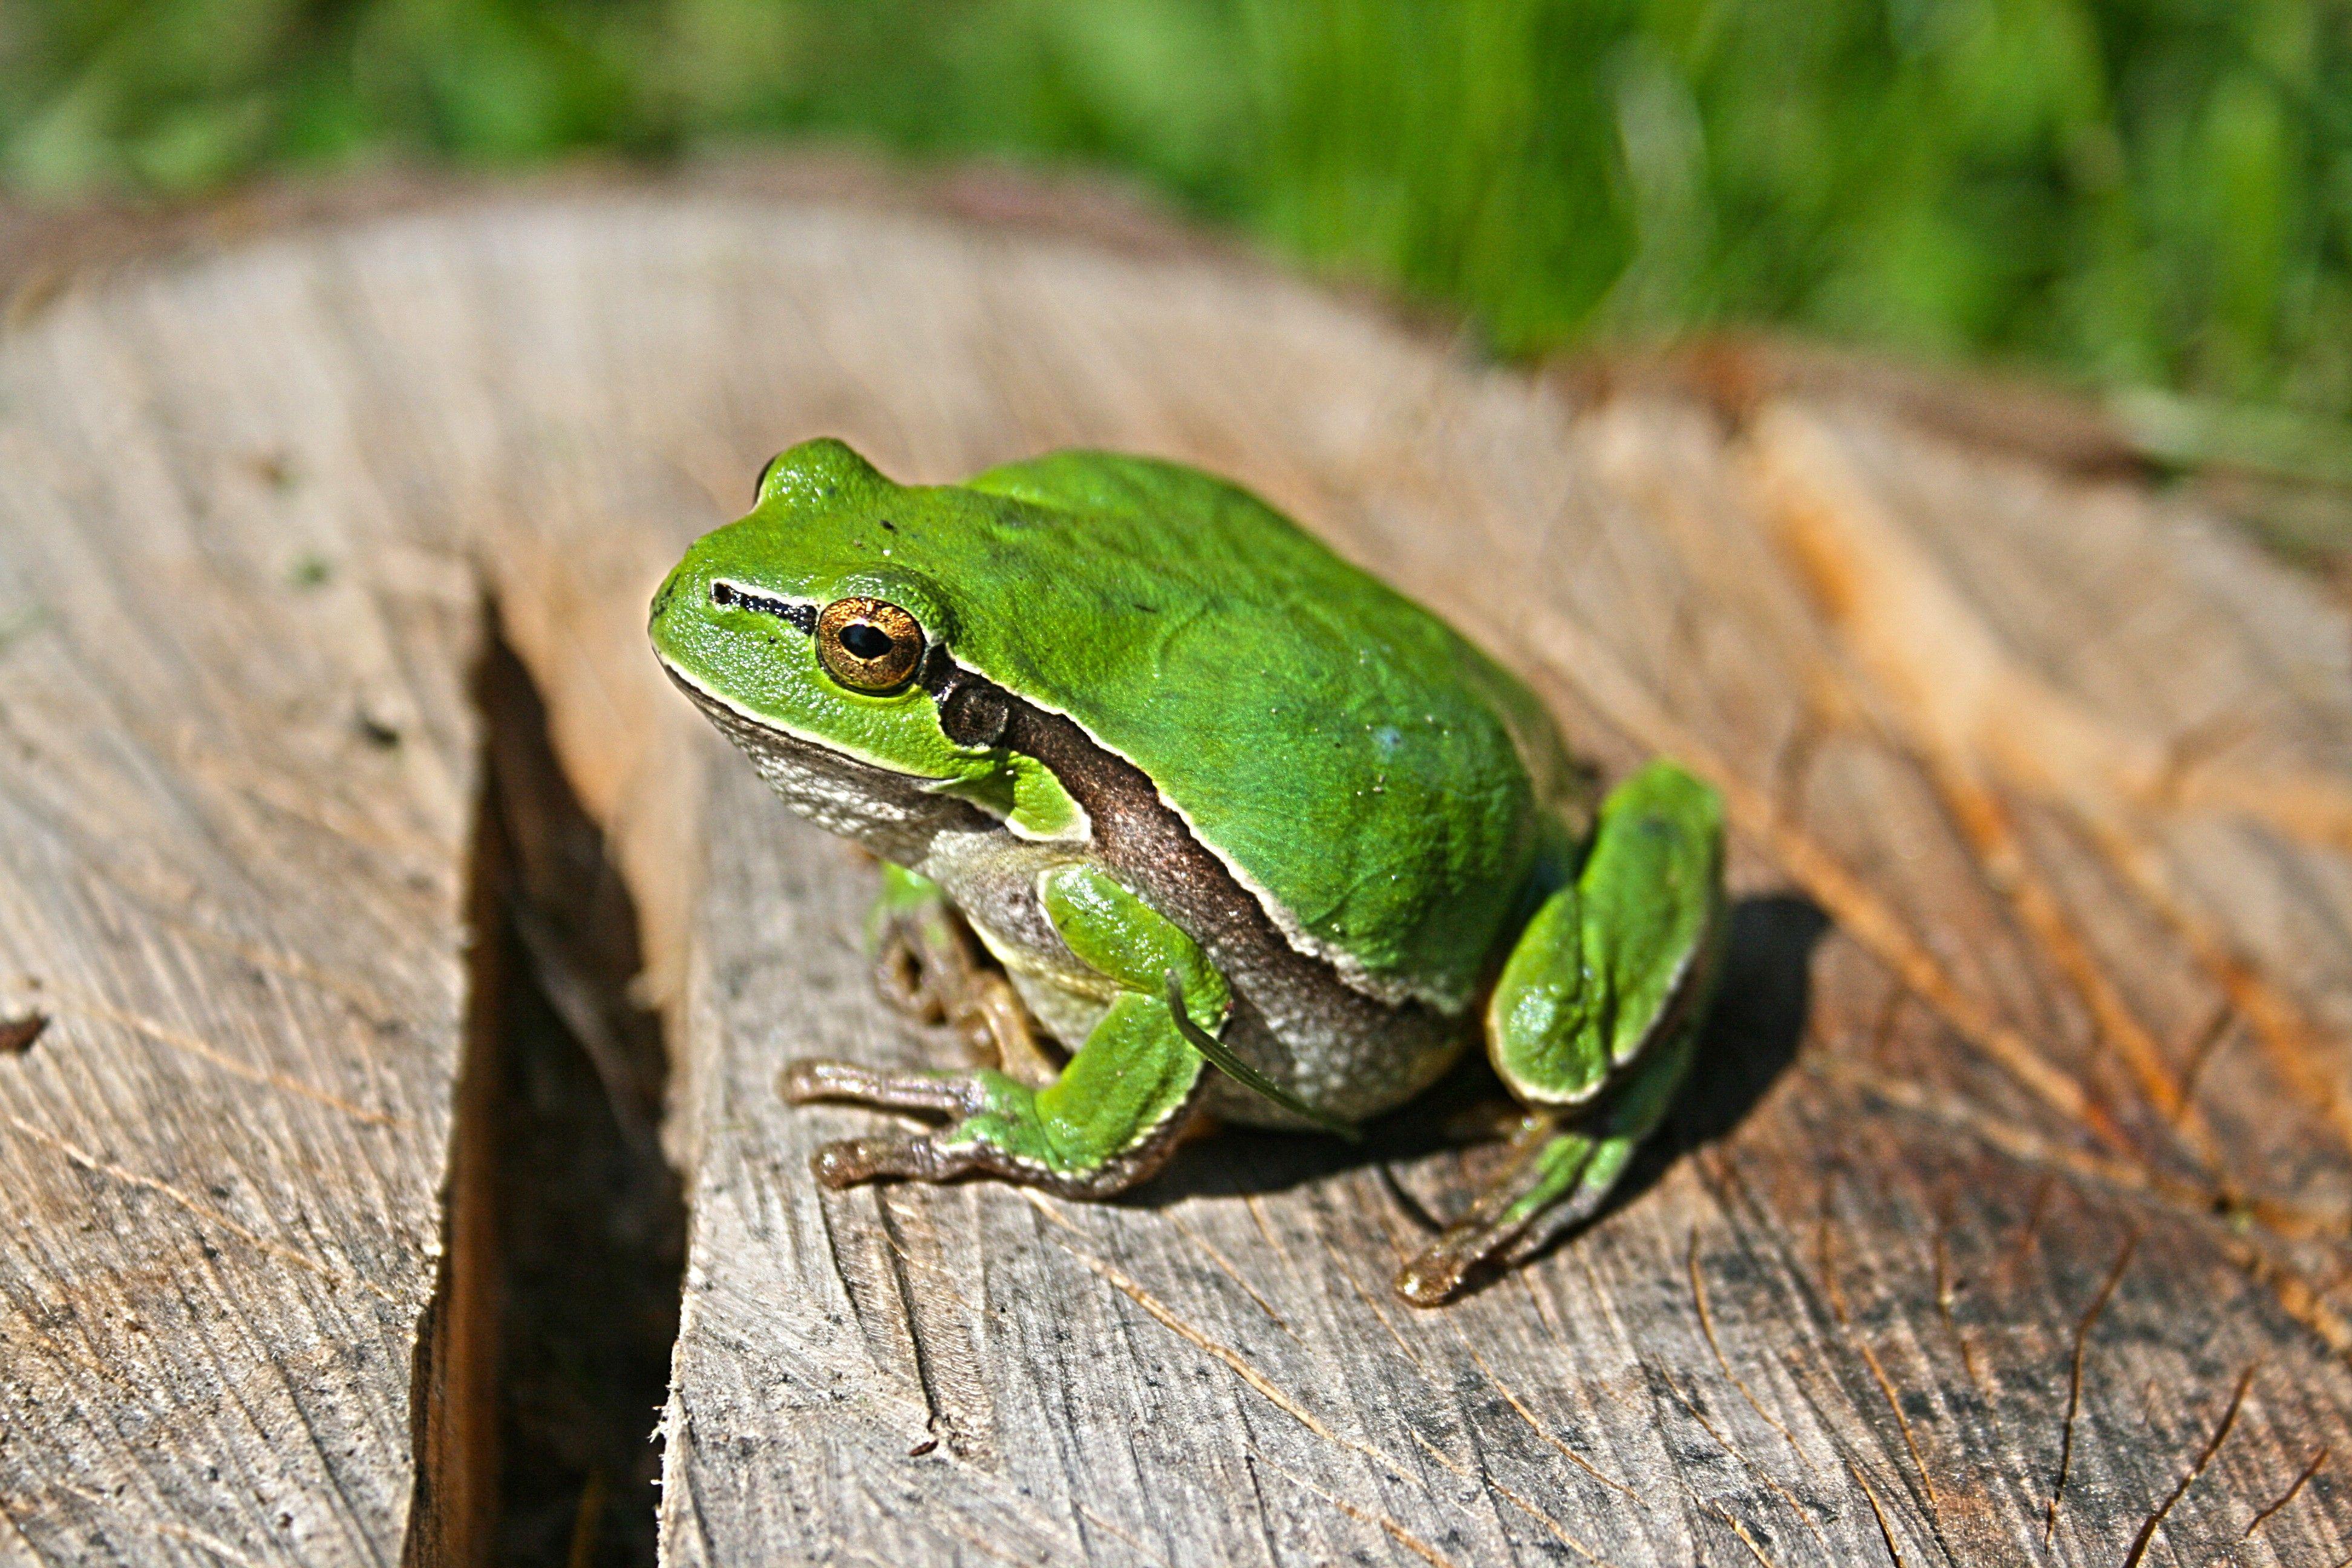 tree frogn amphibian wallpaper iphone 7 download high